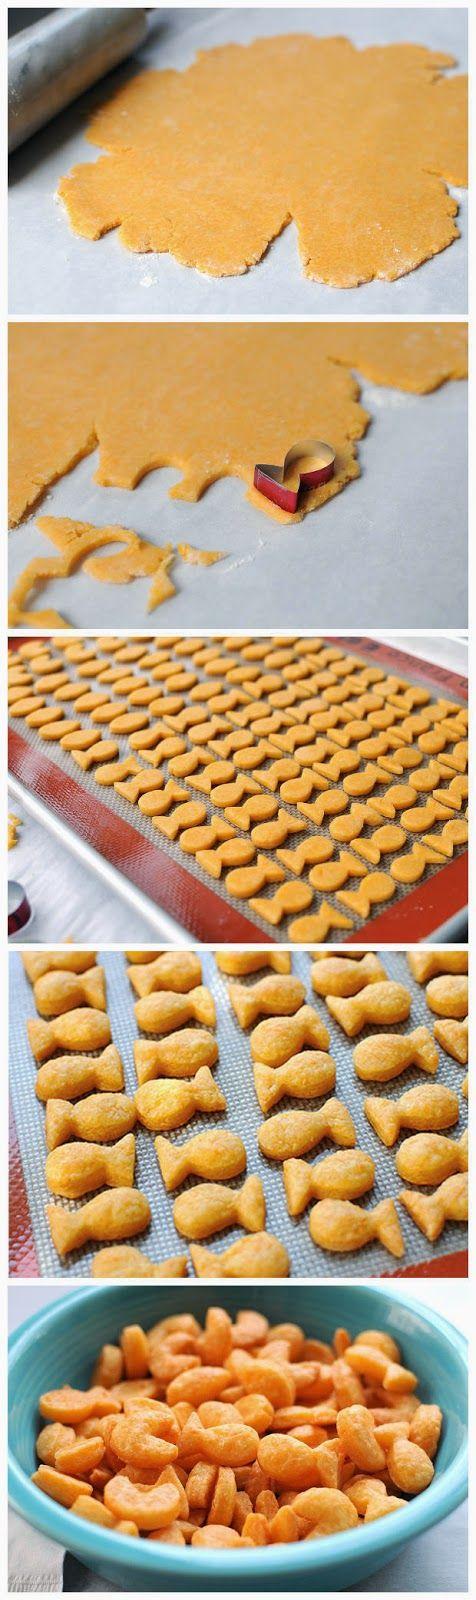 Homemade Goldfish Crackers - sharedbest